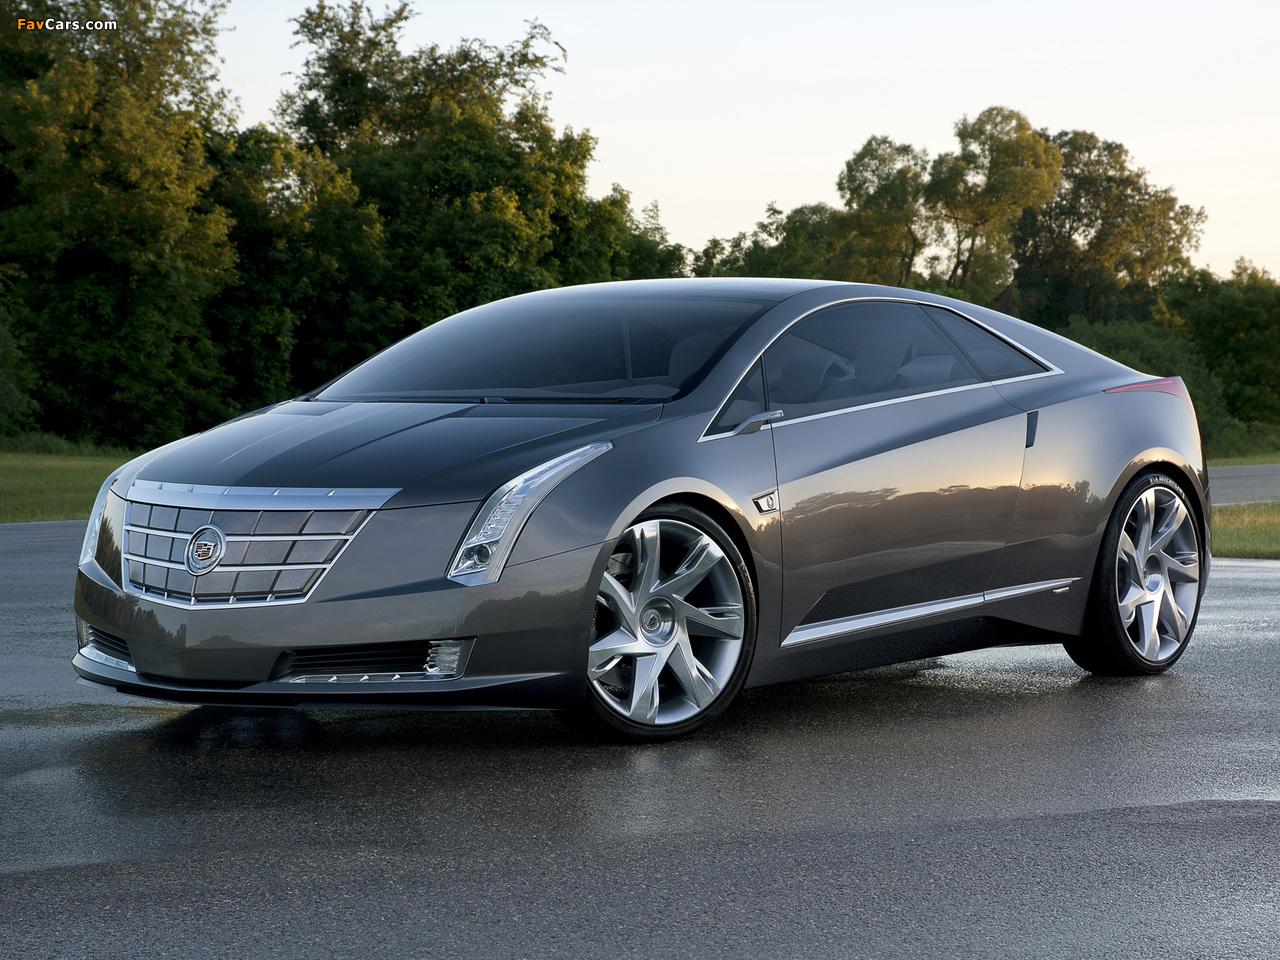 Cadillac Converj Concept 2009 pictures (1280 x 960)